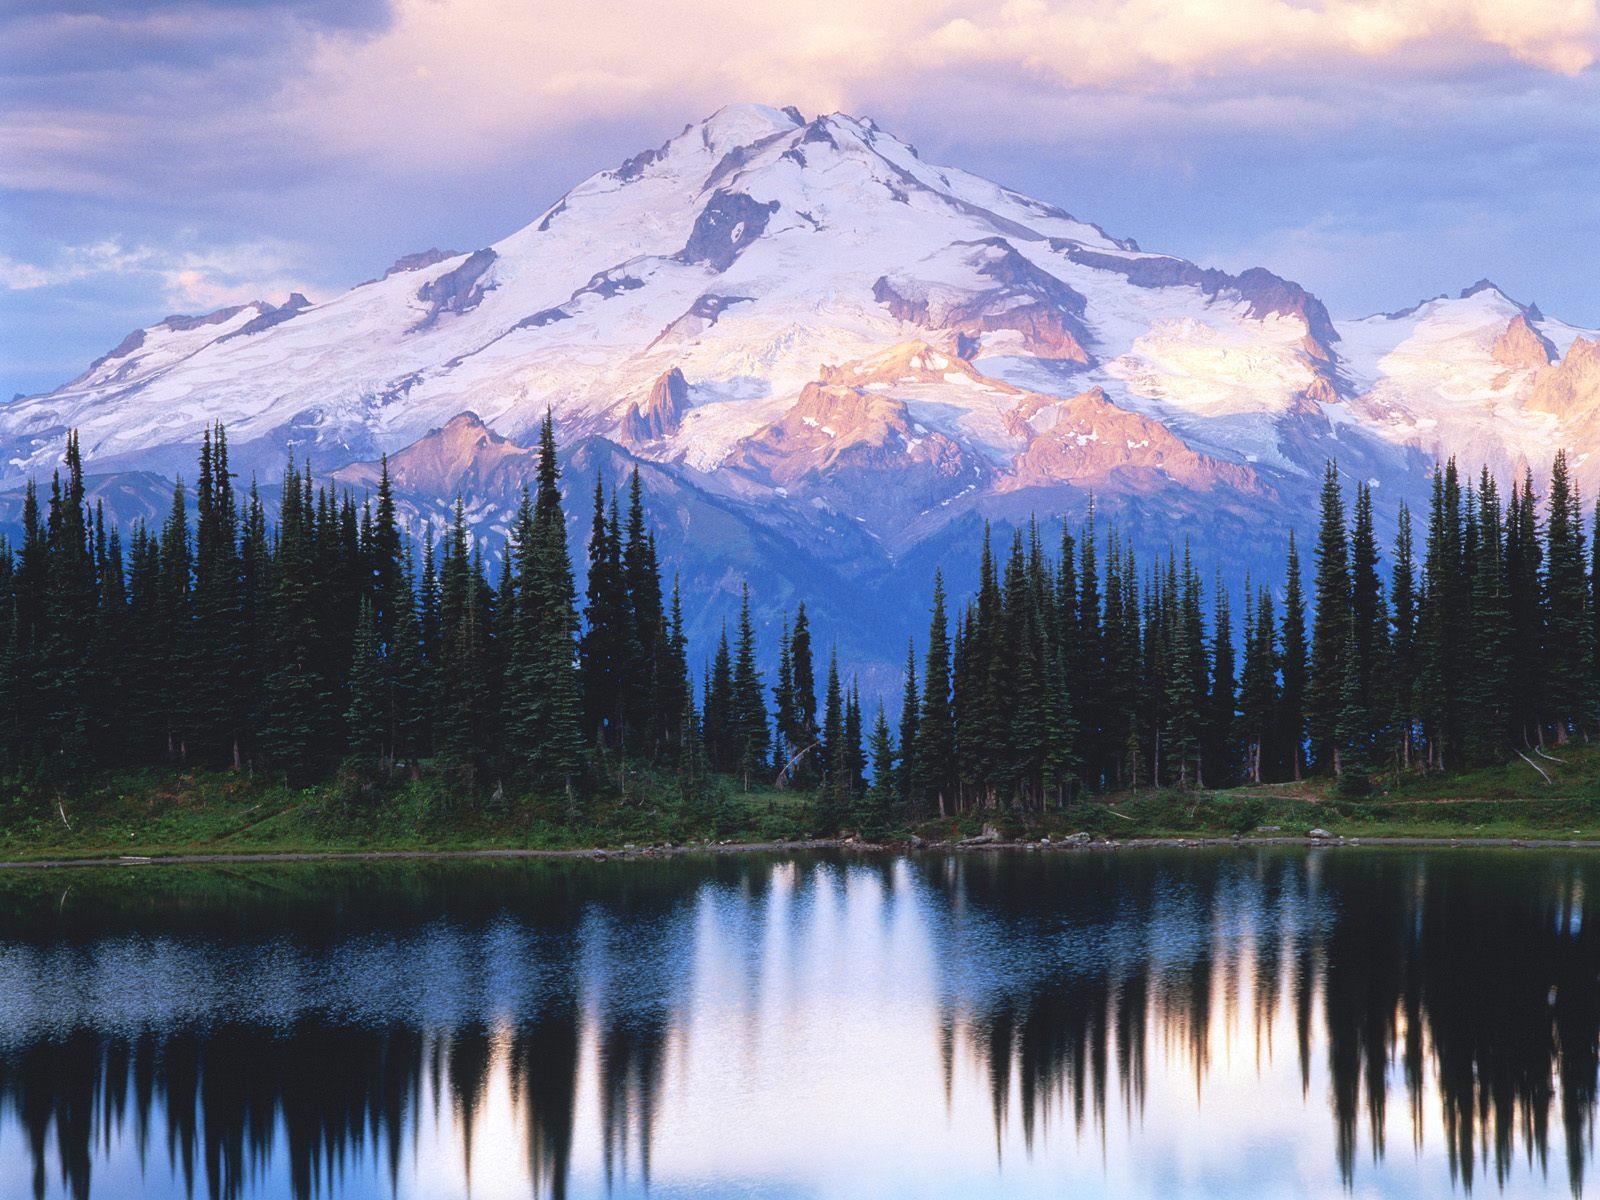 Mountain lakes hd desktop wallpaper - Imagenes de paisajes ...